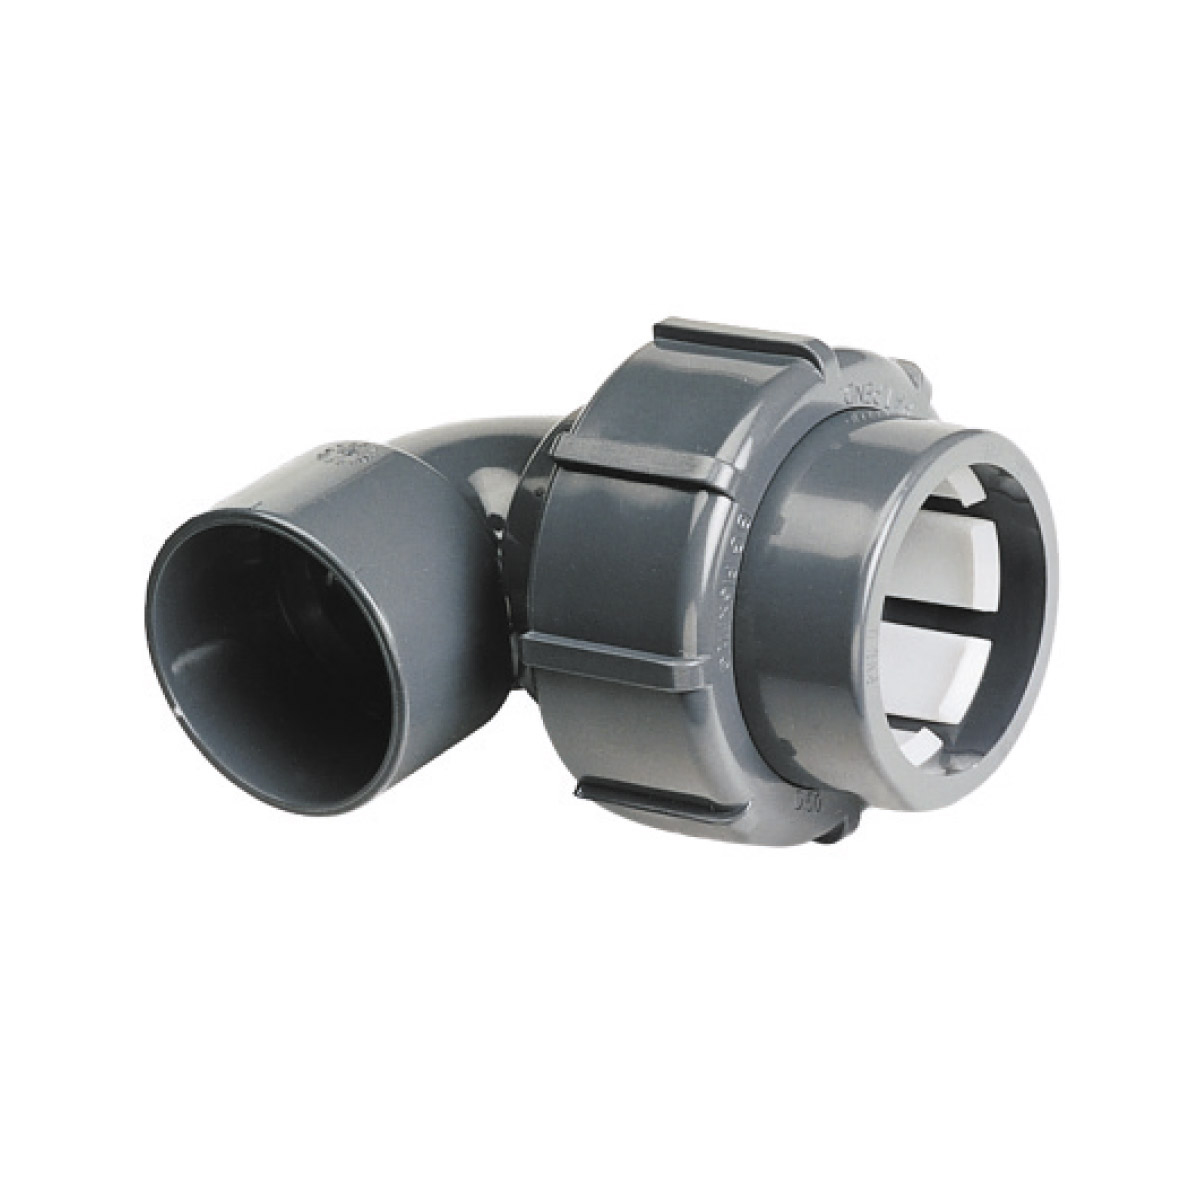 "Übergangswinkel FlexFit 90° PVC Klemm - IG d50-1 1/2"" BSP PN4 Übergangswinkel FlexFit 90° PVC Klemm - IG d50-1 1/2"" BSP PN4"